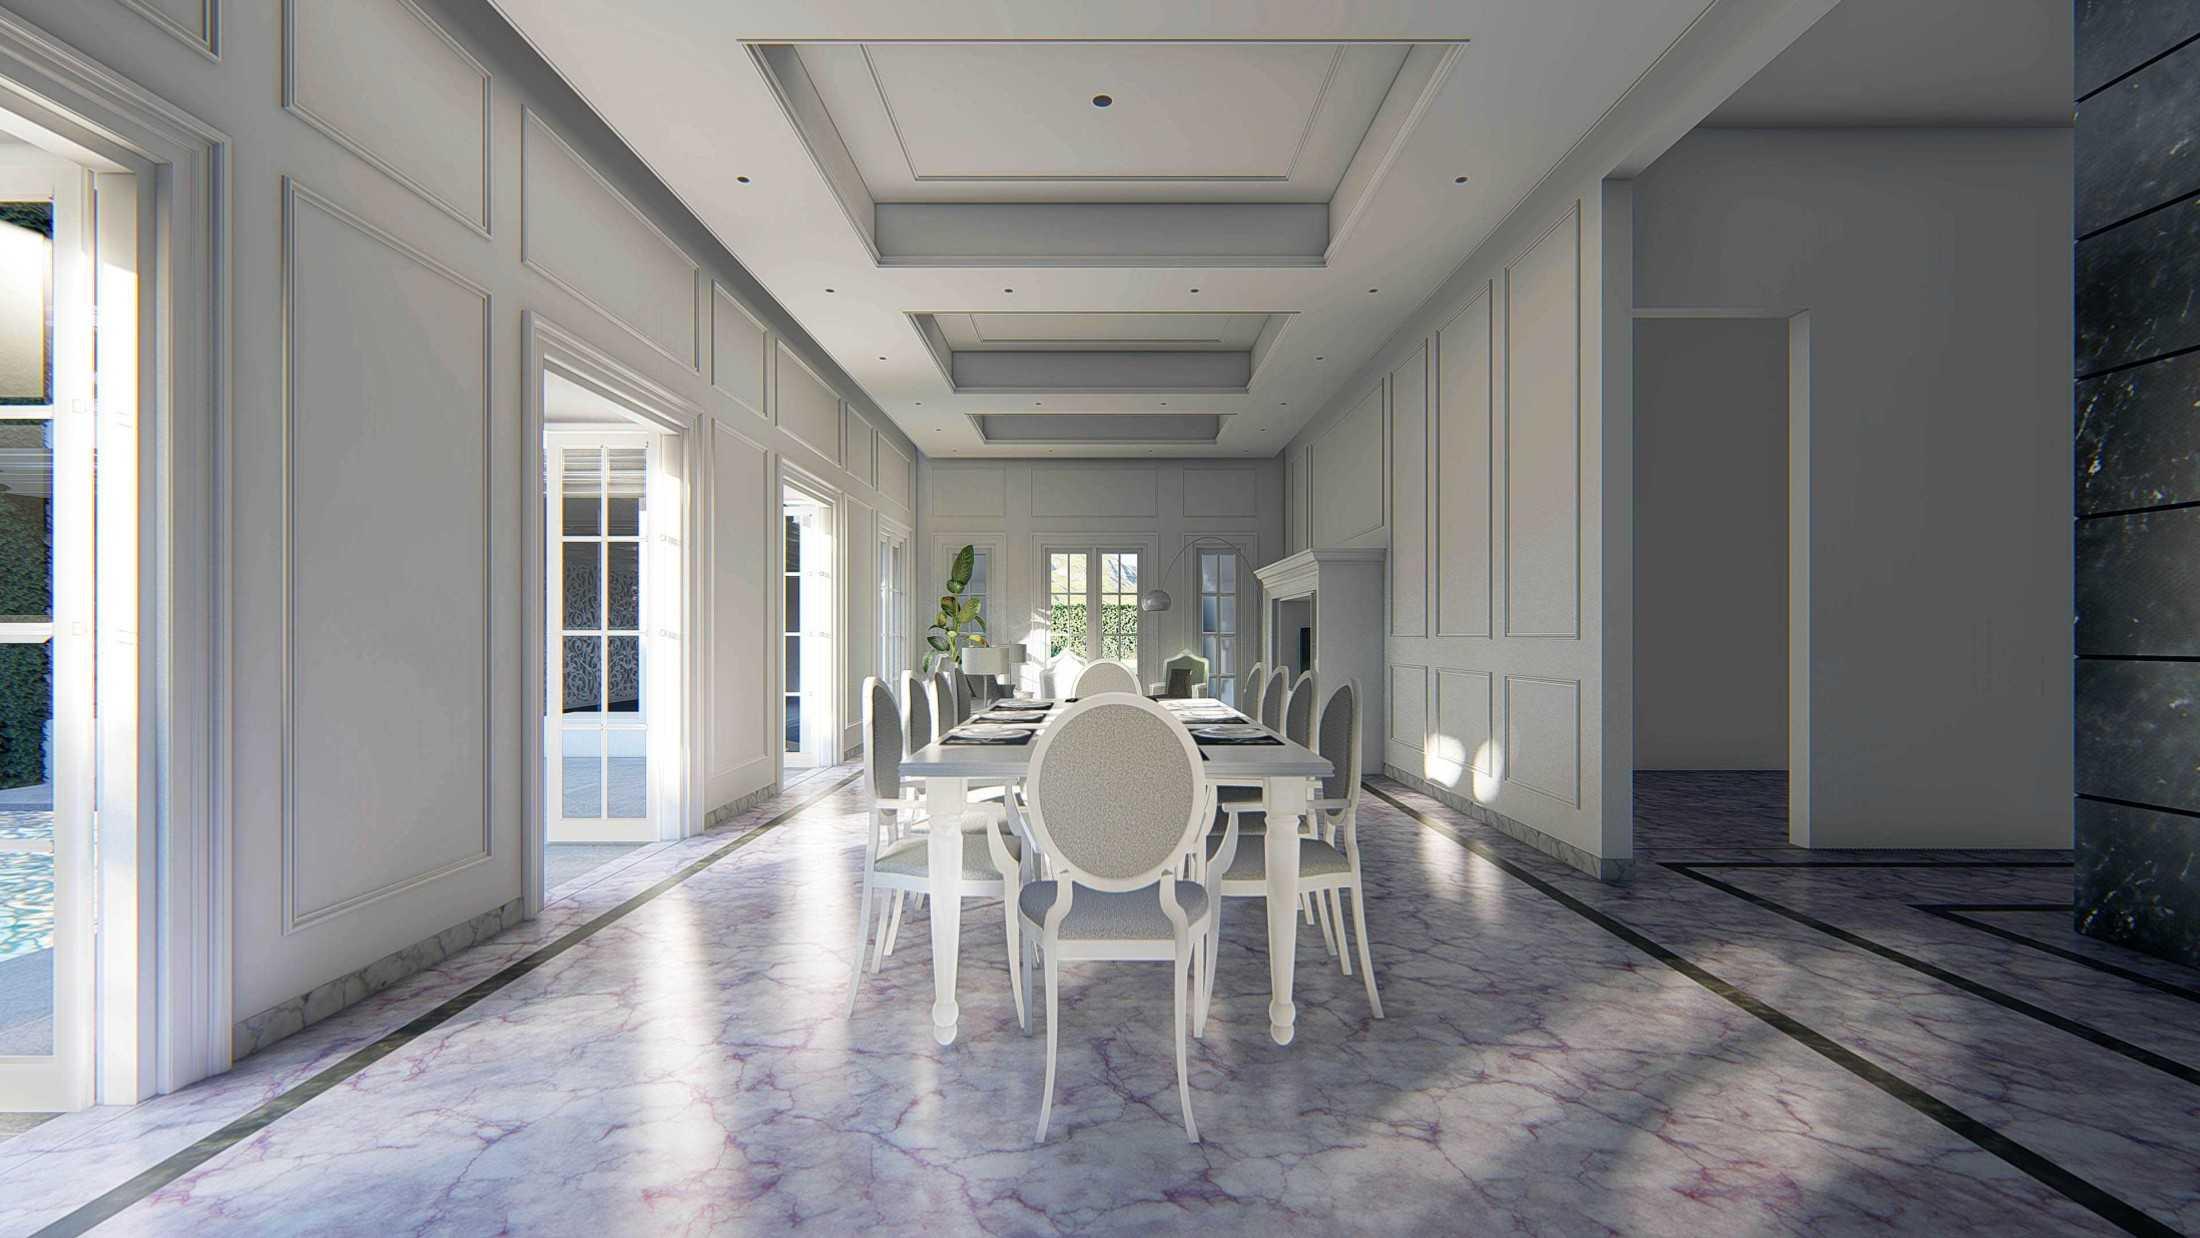 Mahastudio & Partner Hidden Palace House Bogor, Jawa Barat, Indonesia Bogor, Jawa Barat, Indonesia American Style Dining Room  64166